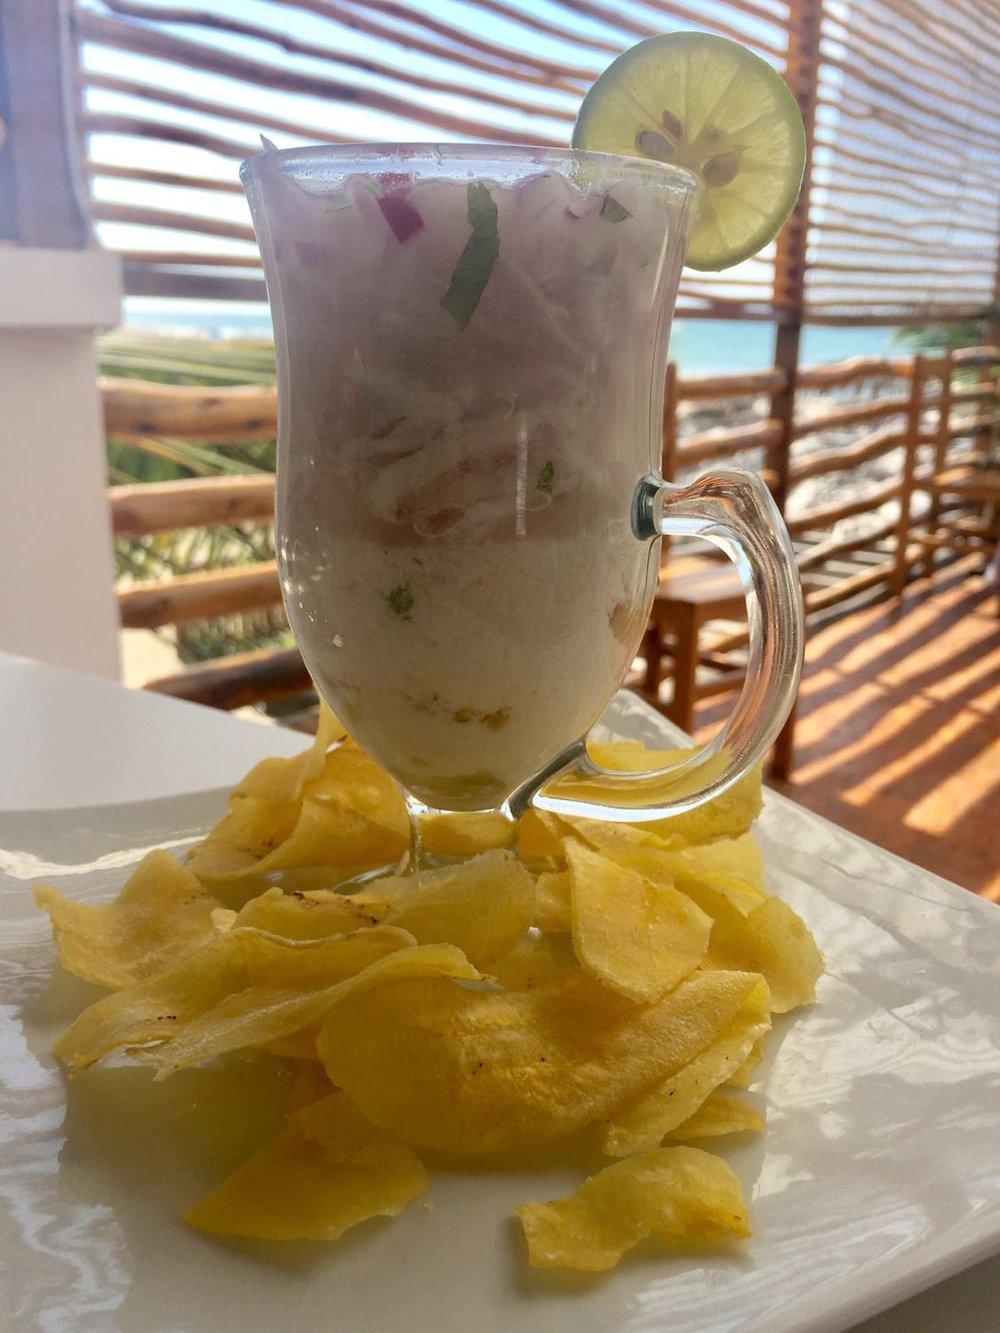 Ceviche in a cup, better known as Lech de Tigr